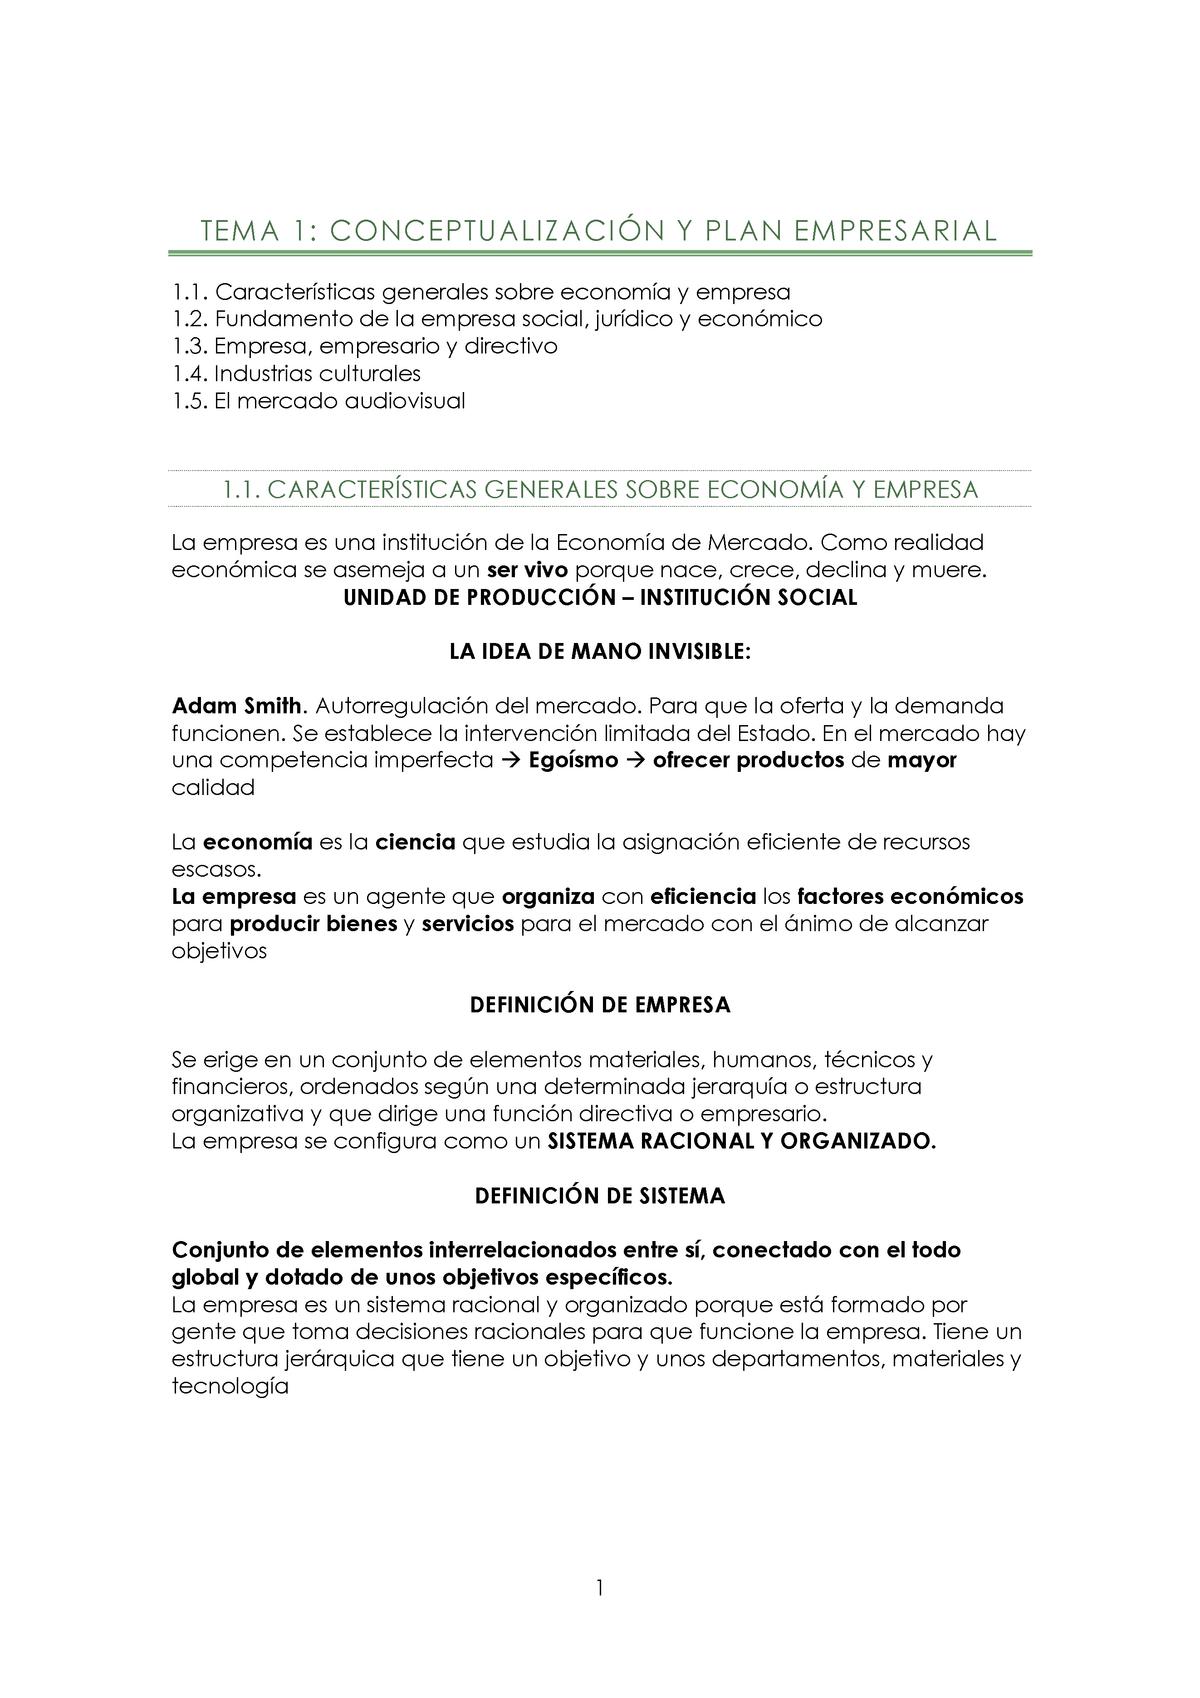 Empresa Apuntes Tema 1 616g01010 Udc Studocu